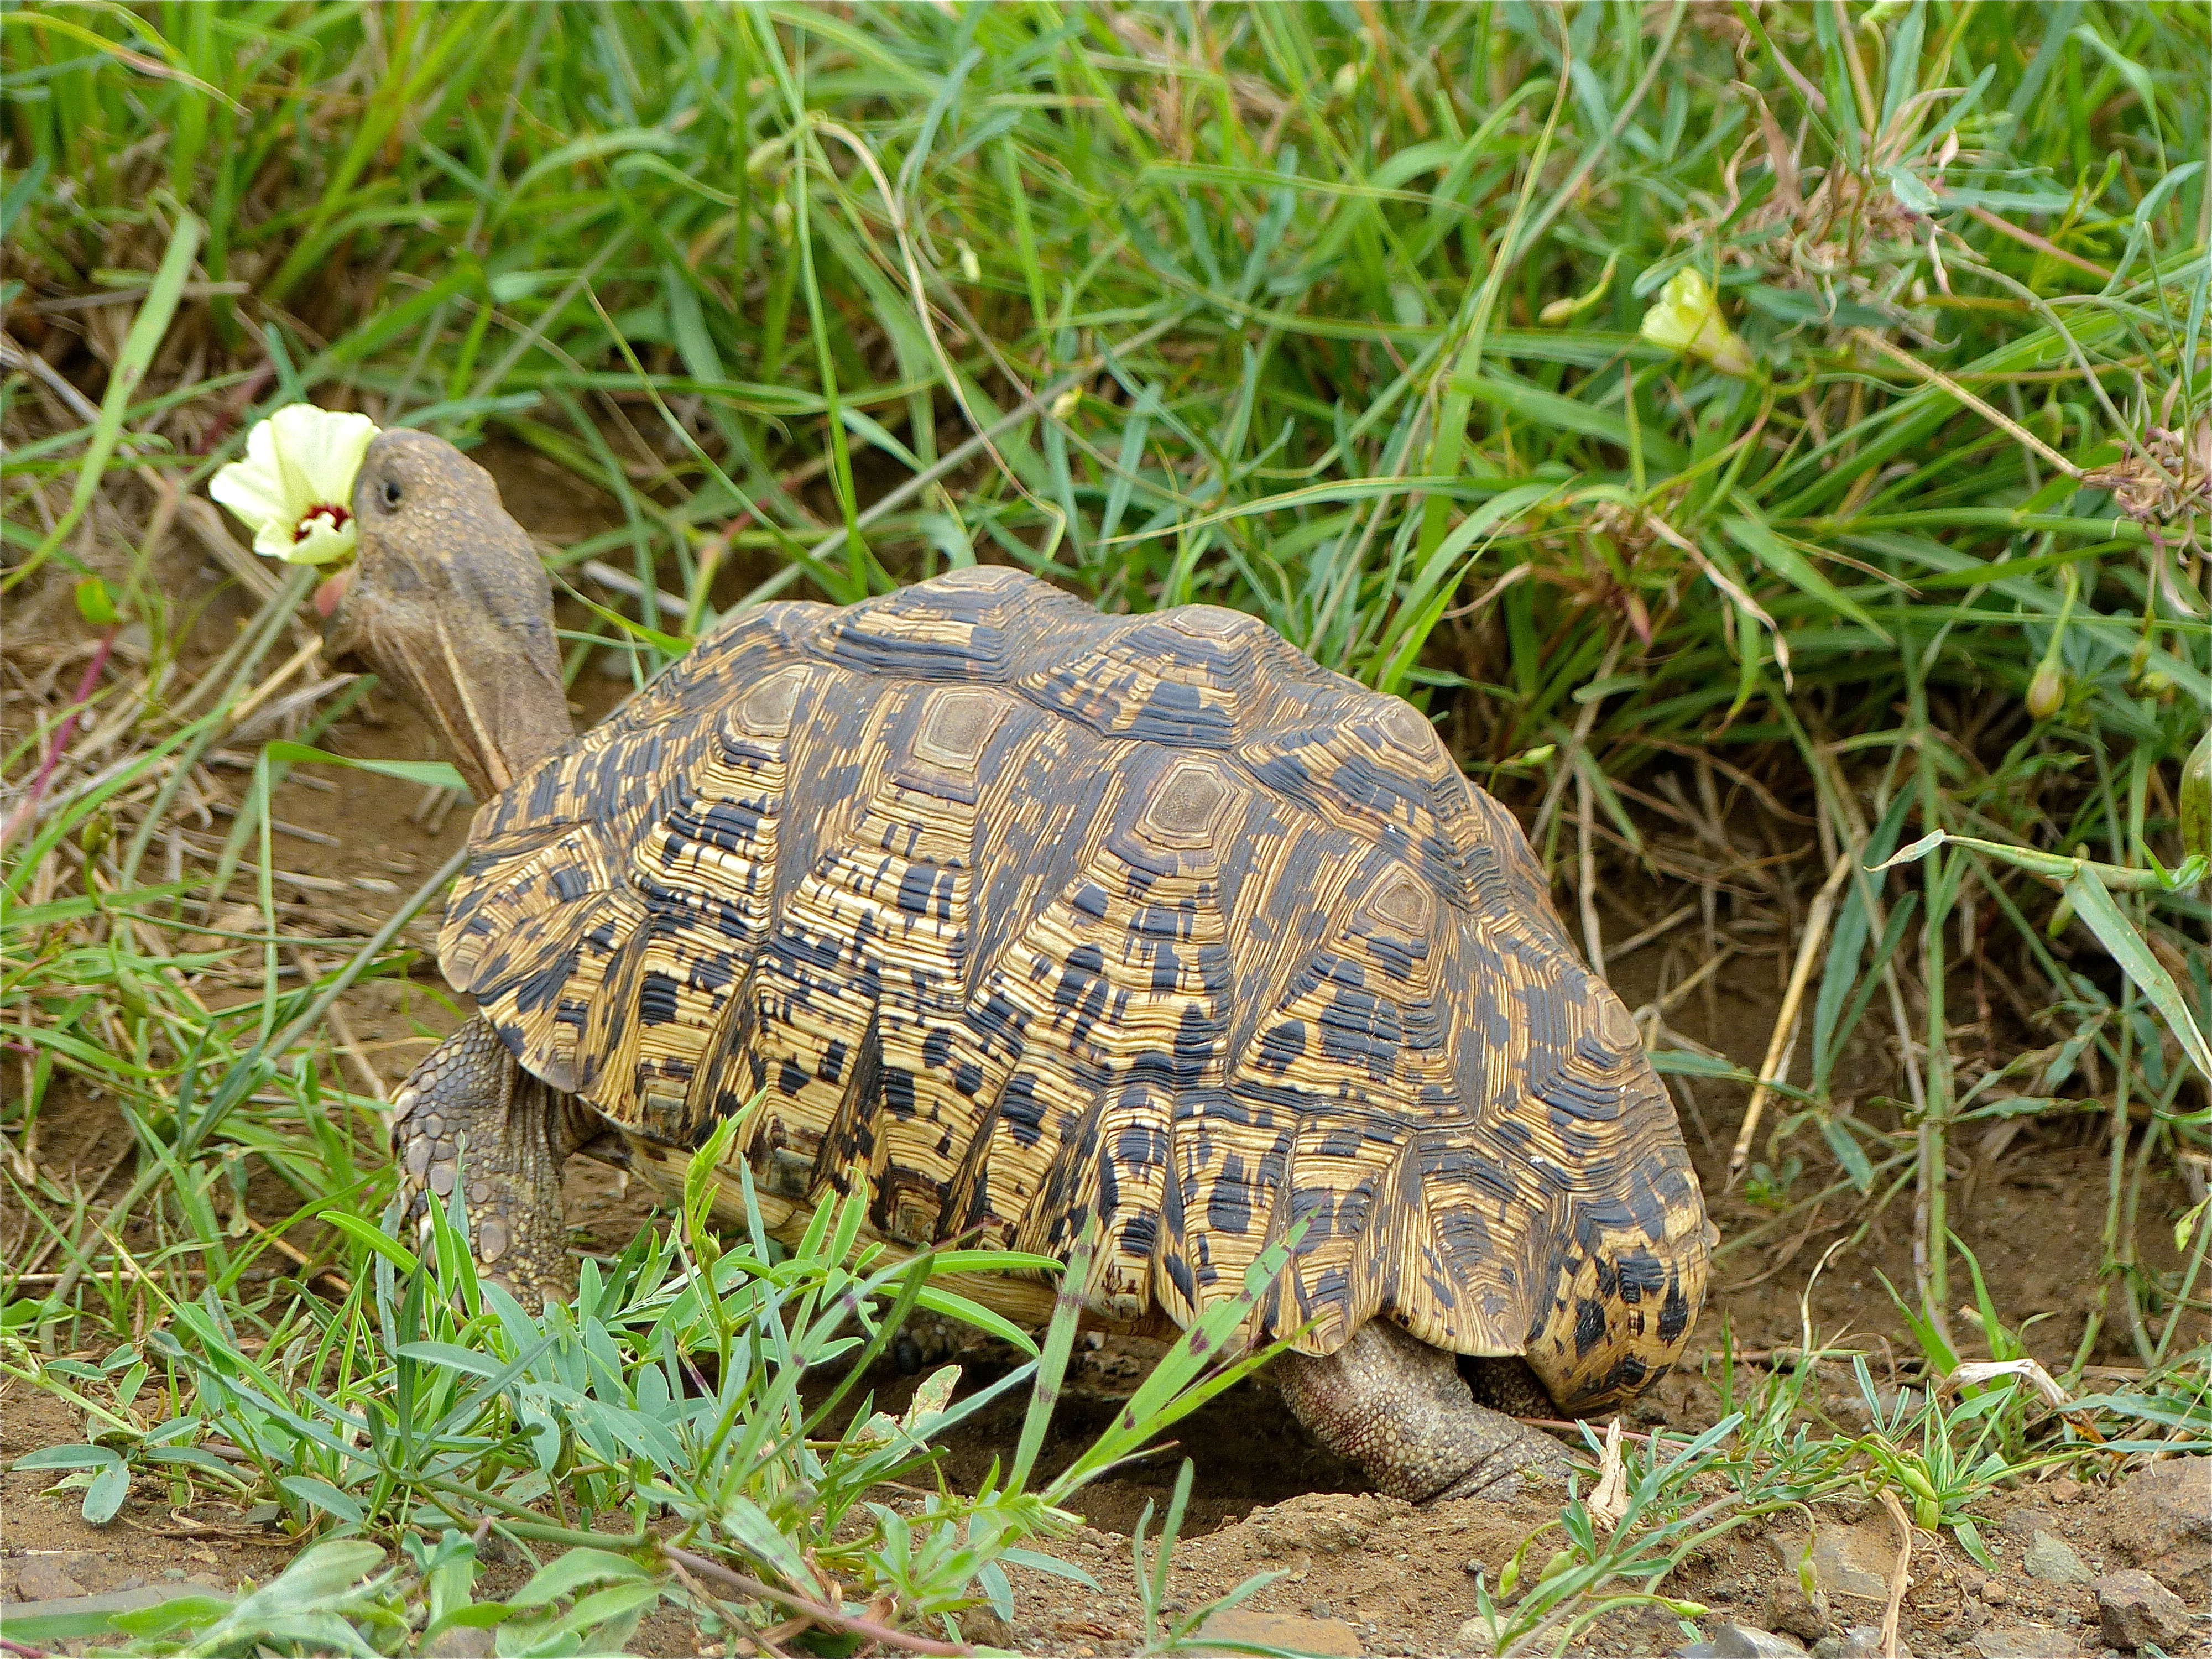 Fileleopard Tortoise Stigmochelys Pardalis Eating Hibiscus Flower